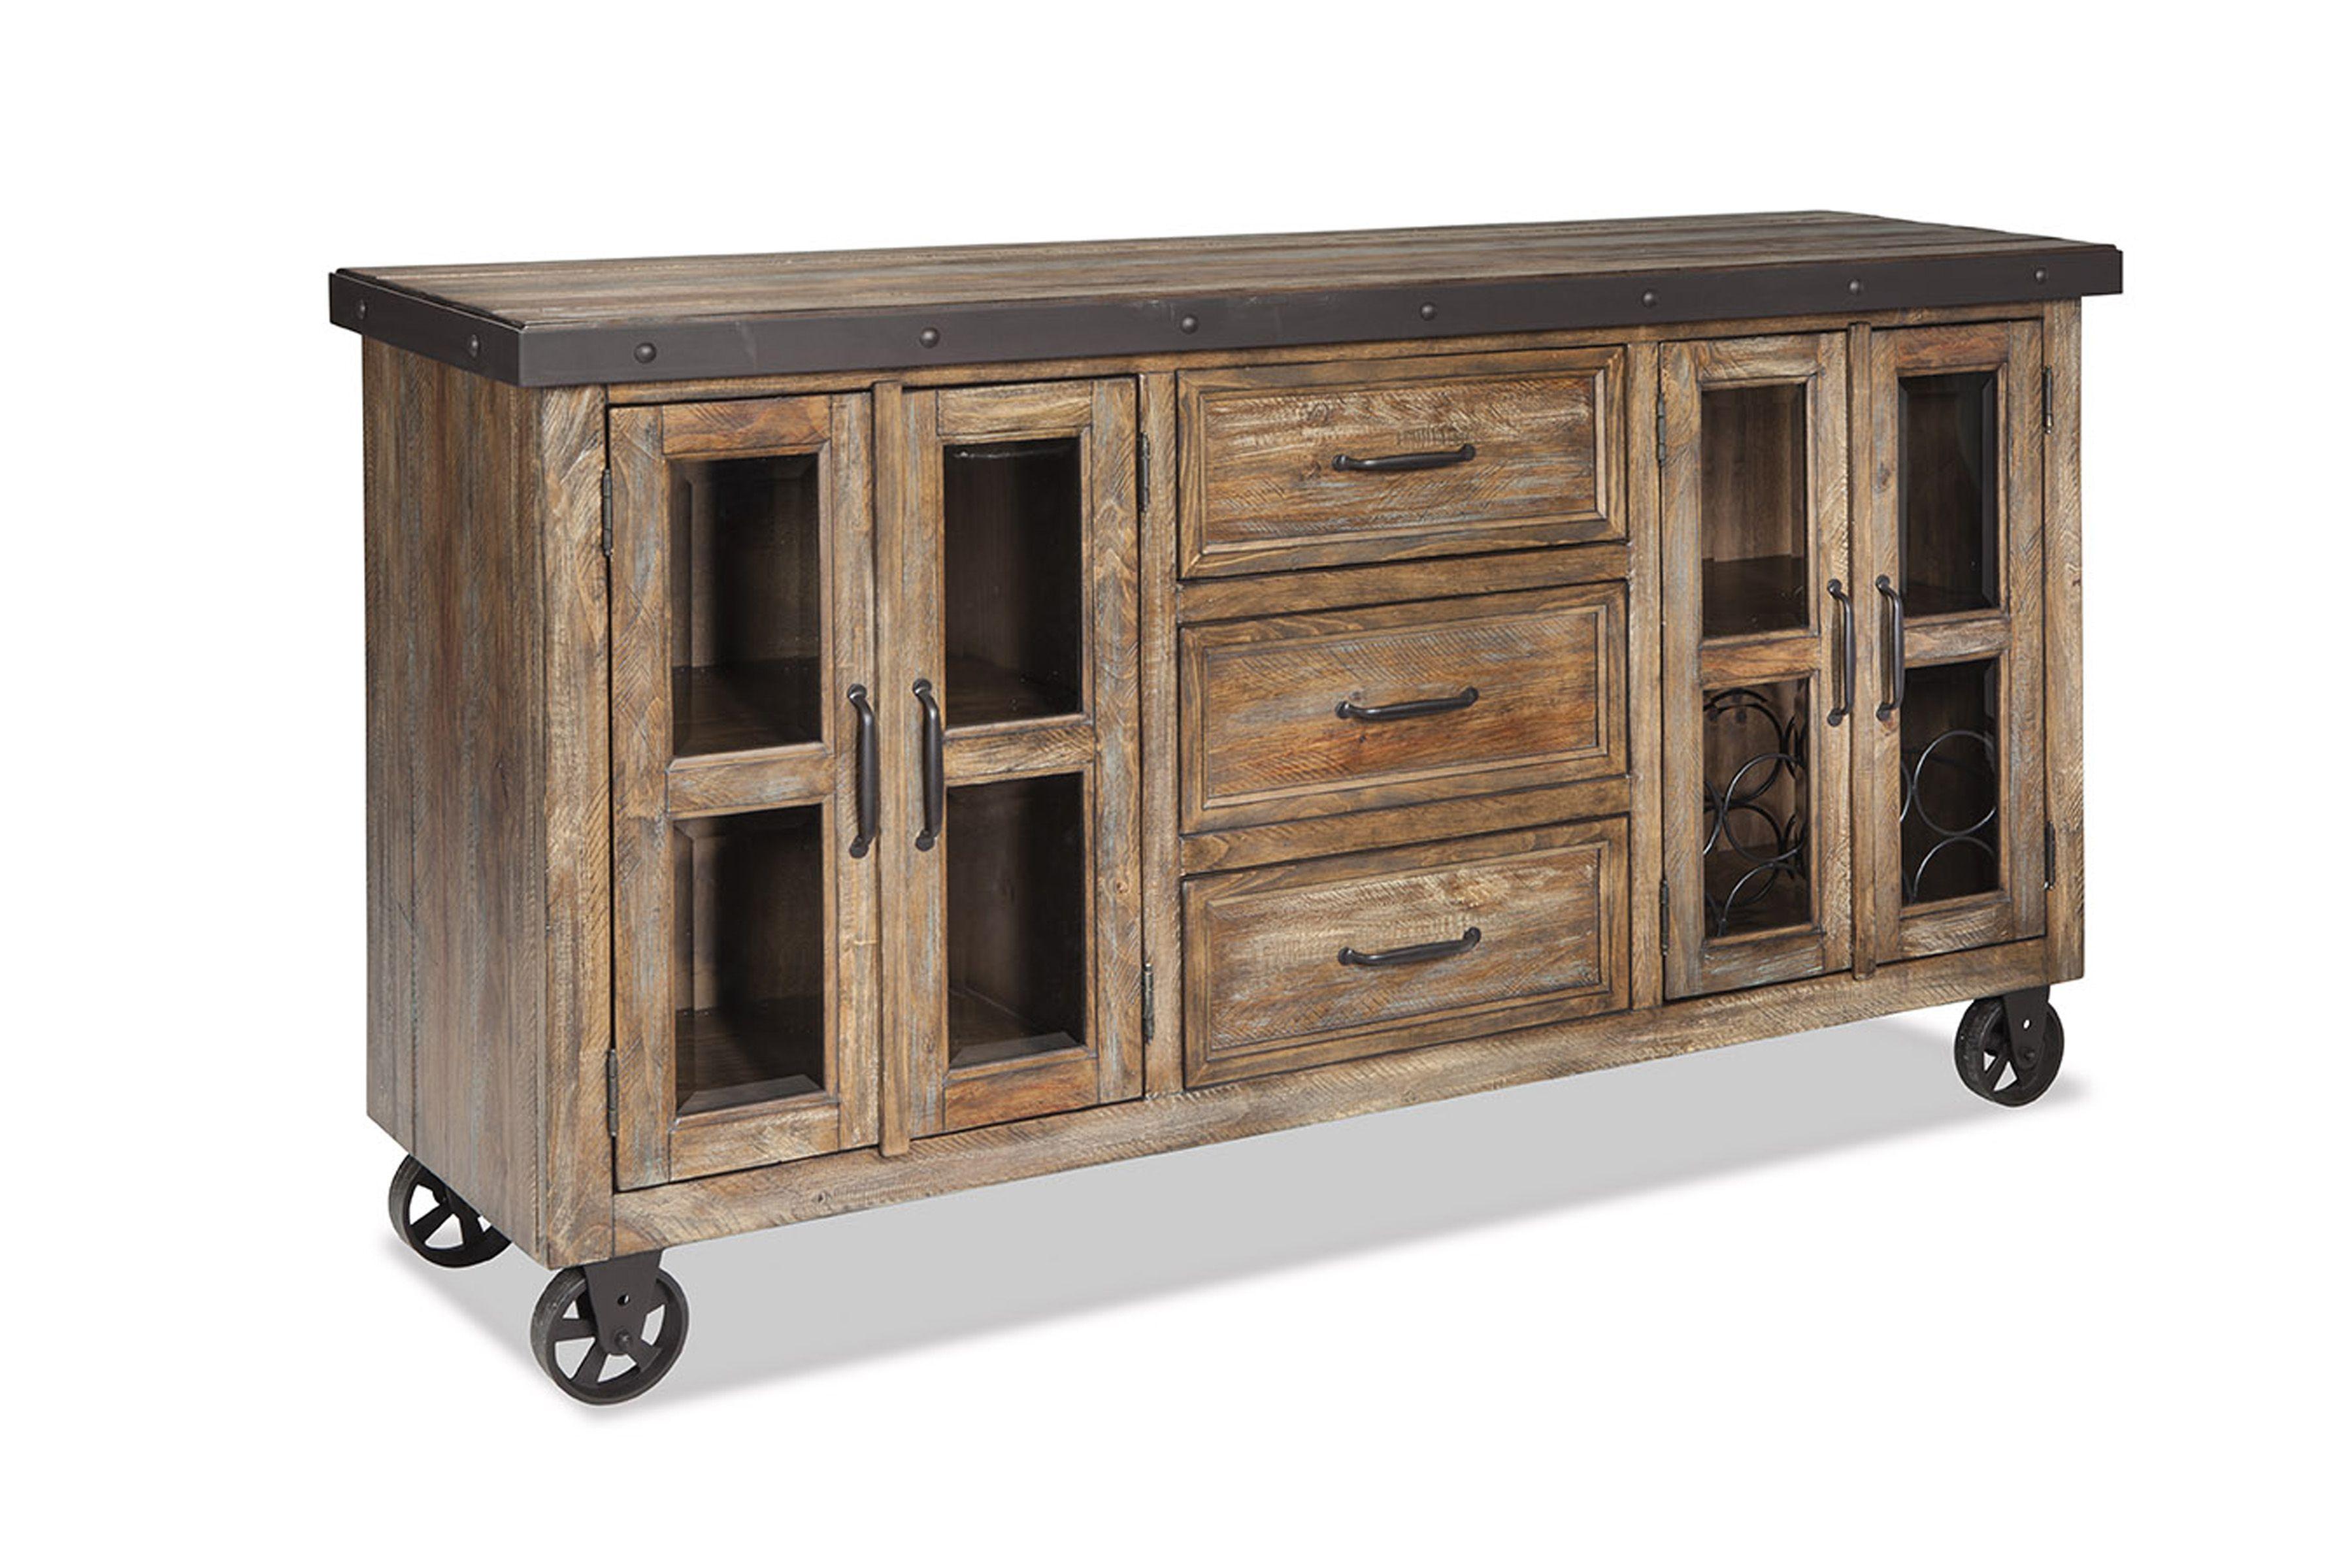 Buffet Rustic Sideboard Sideboard Furniture Metal Sideboard